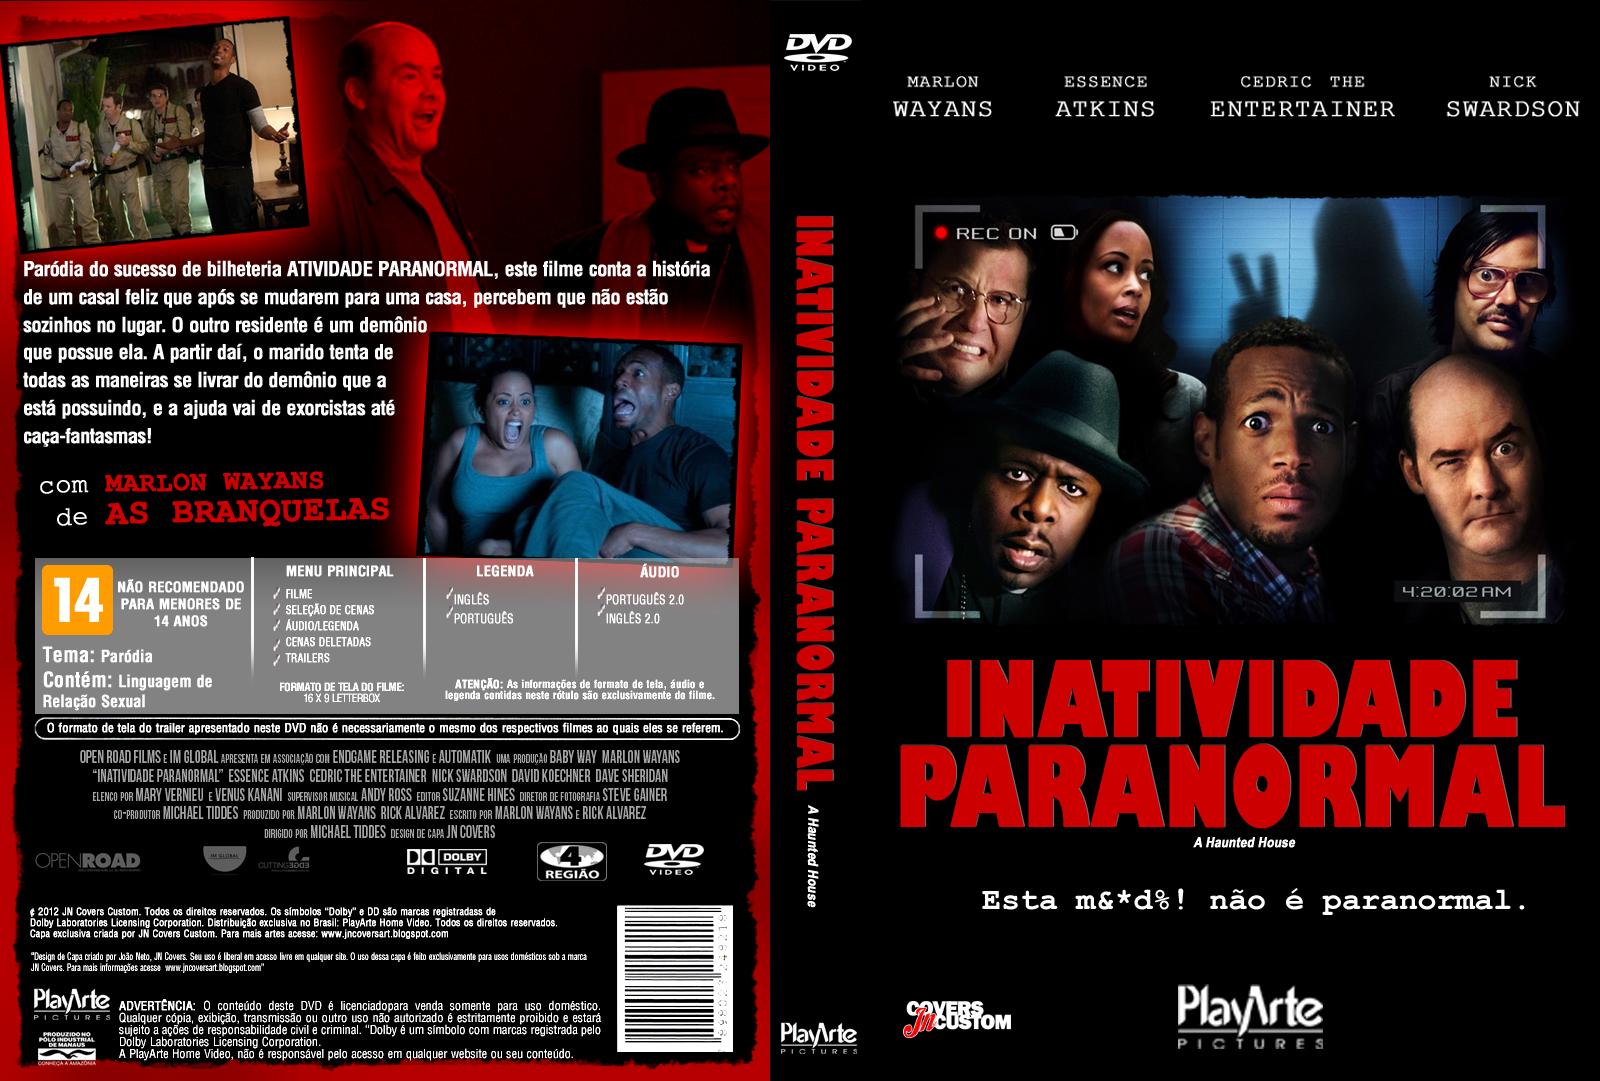 Inatividade Paranormal Elenco Pretty arquivos paranormal - xandao download™